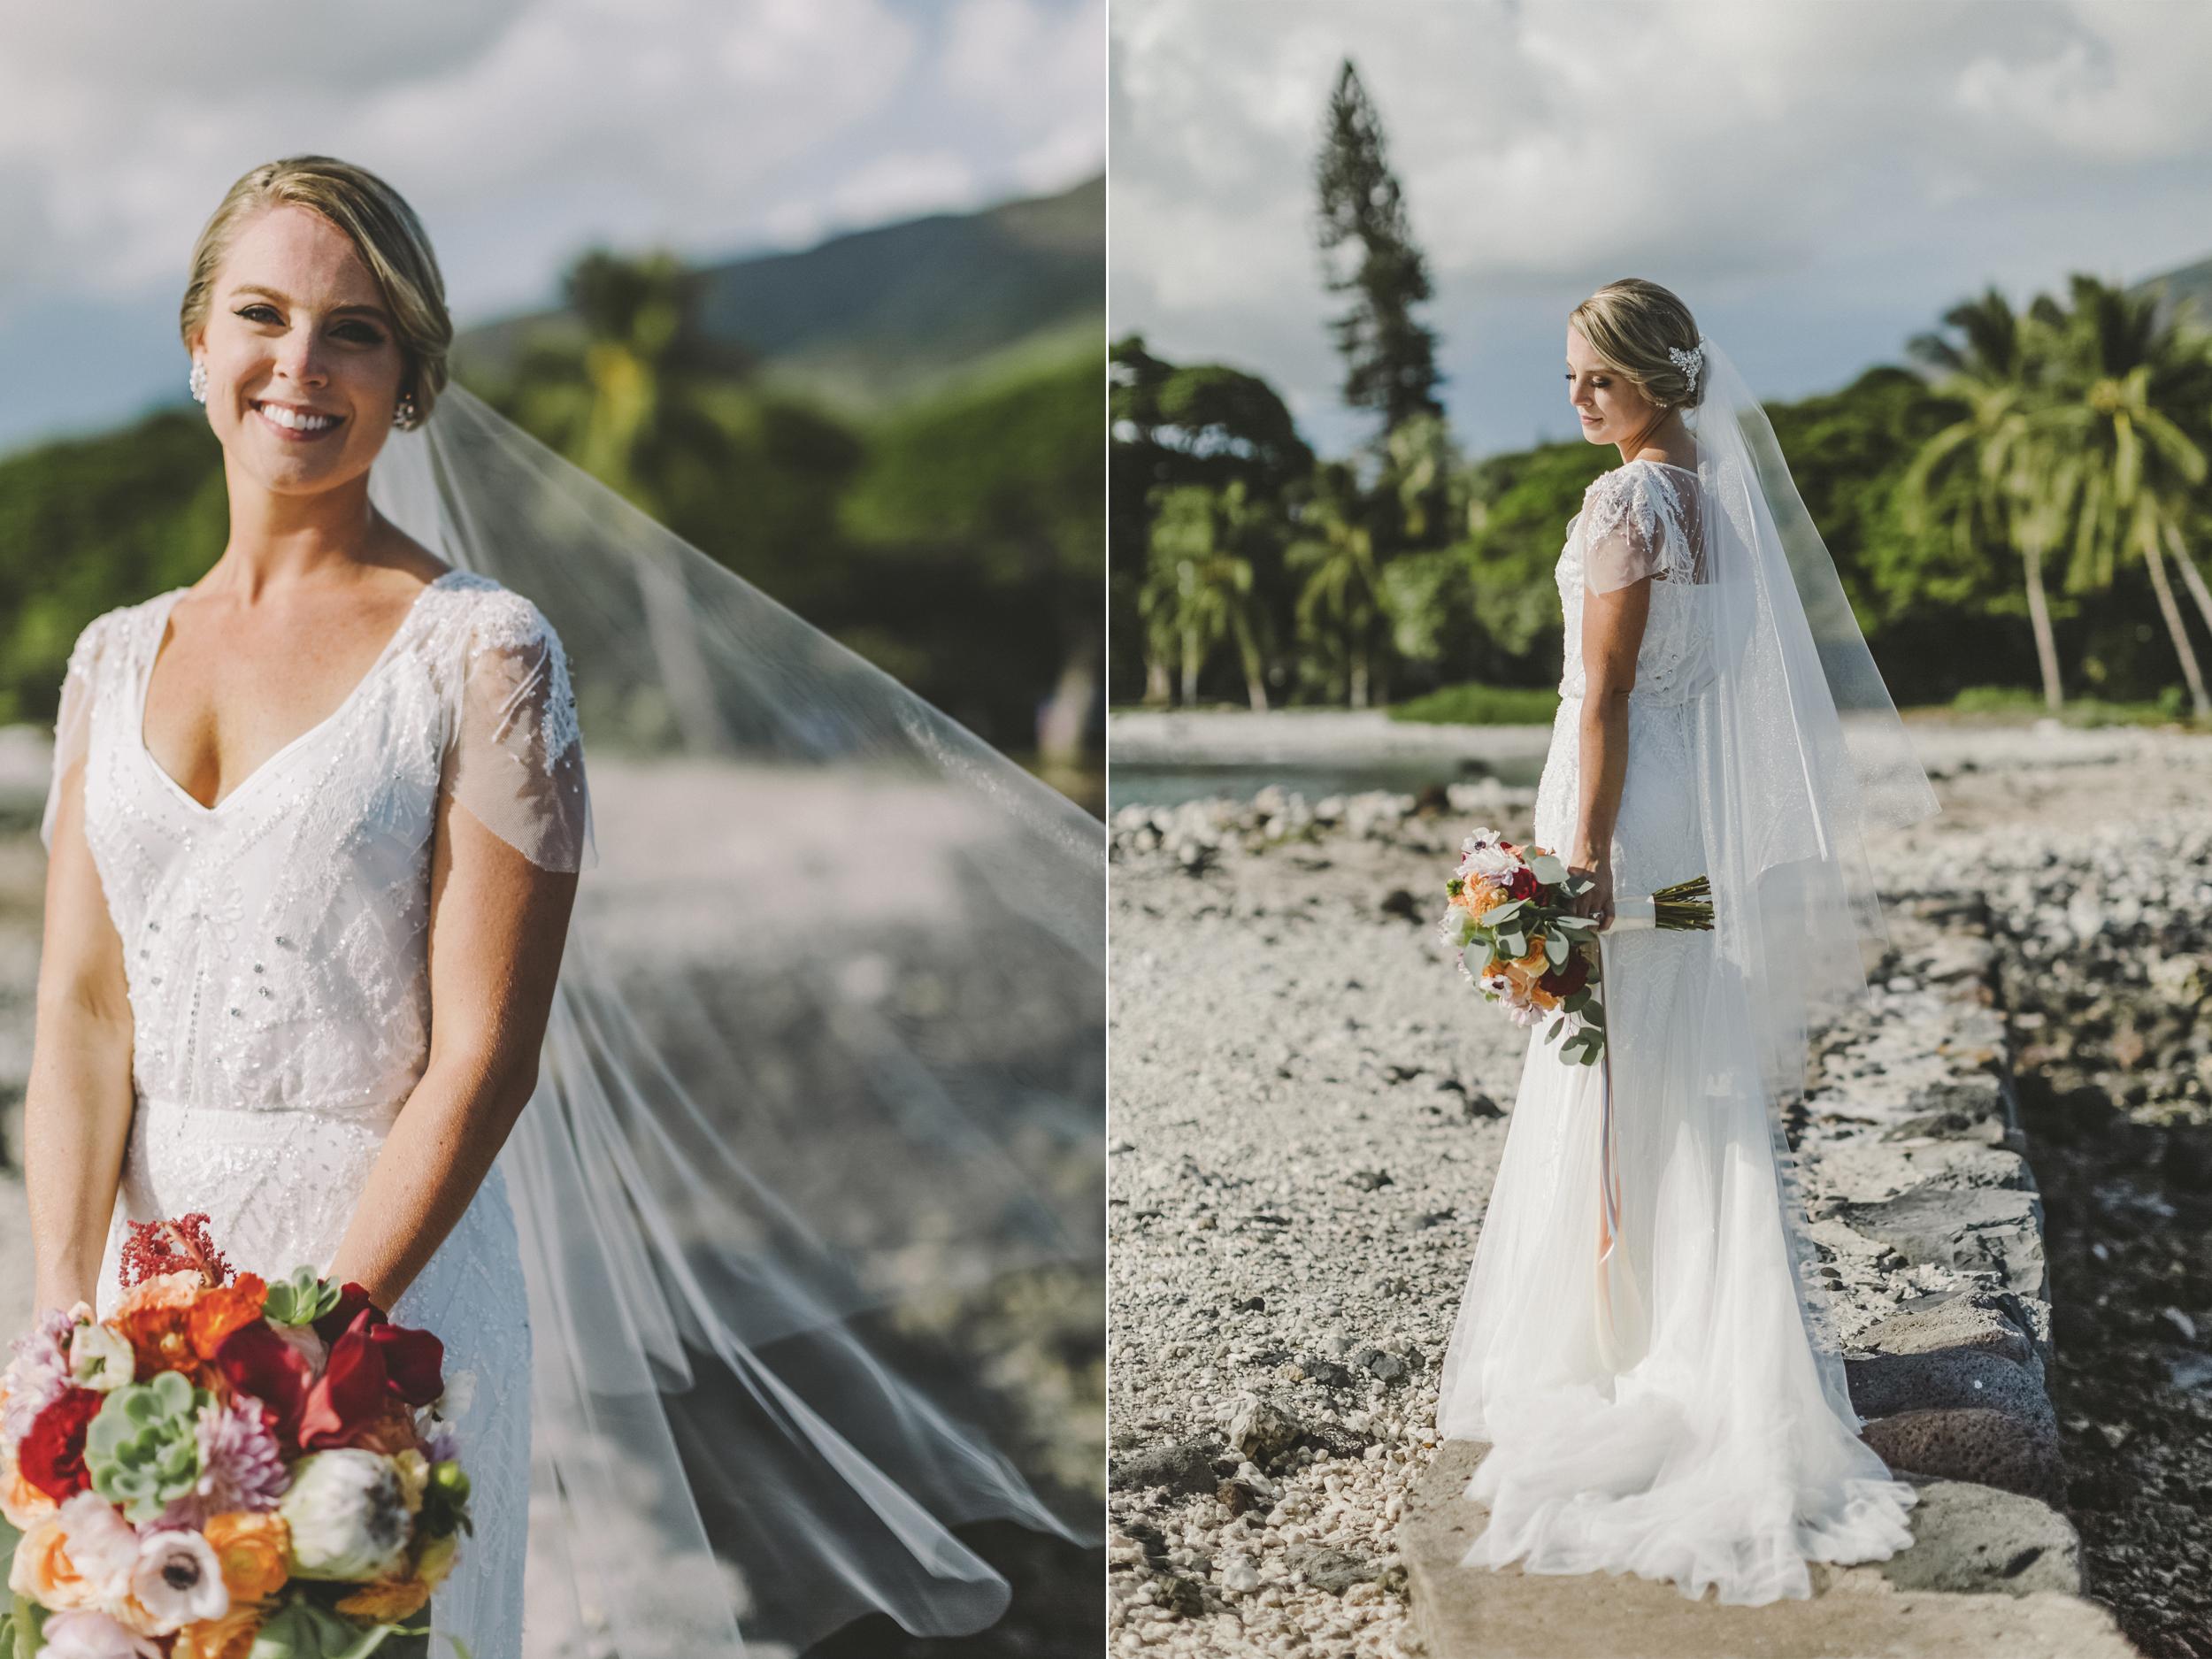 angie-diaz-photography-maui-wedding-mel-matt-72.jpg